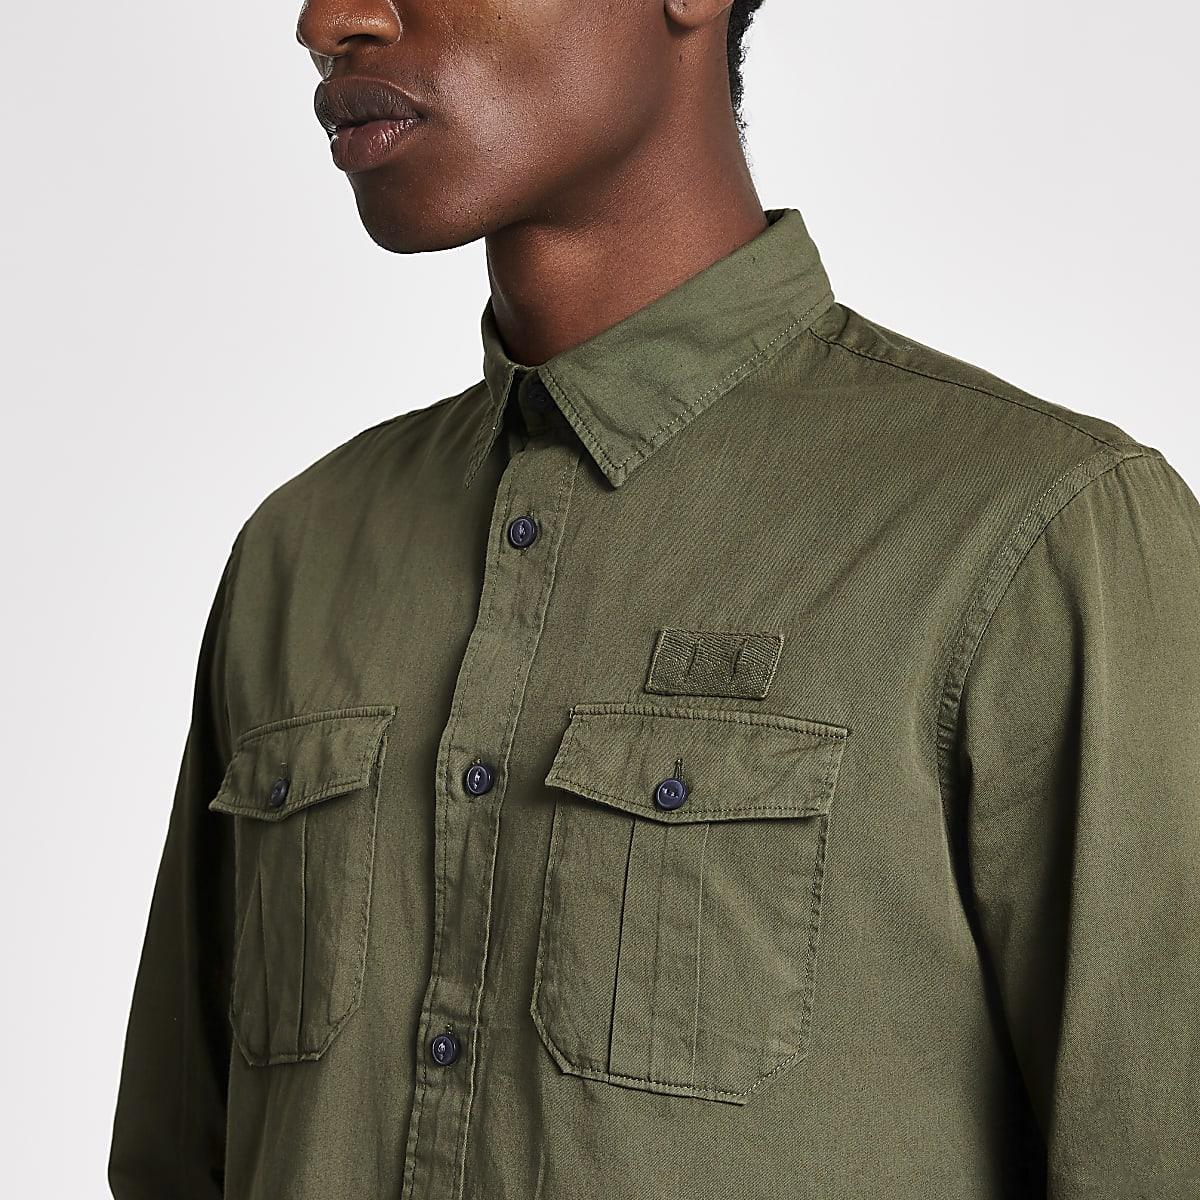 Selected Homme - Chemise ajustée verte